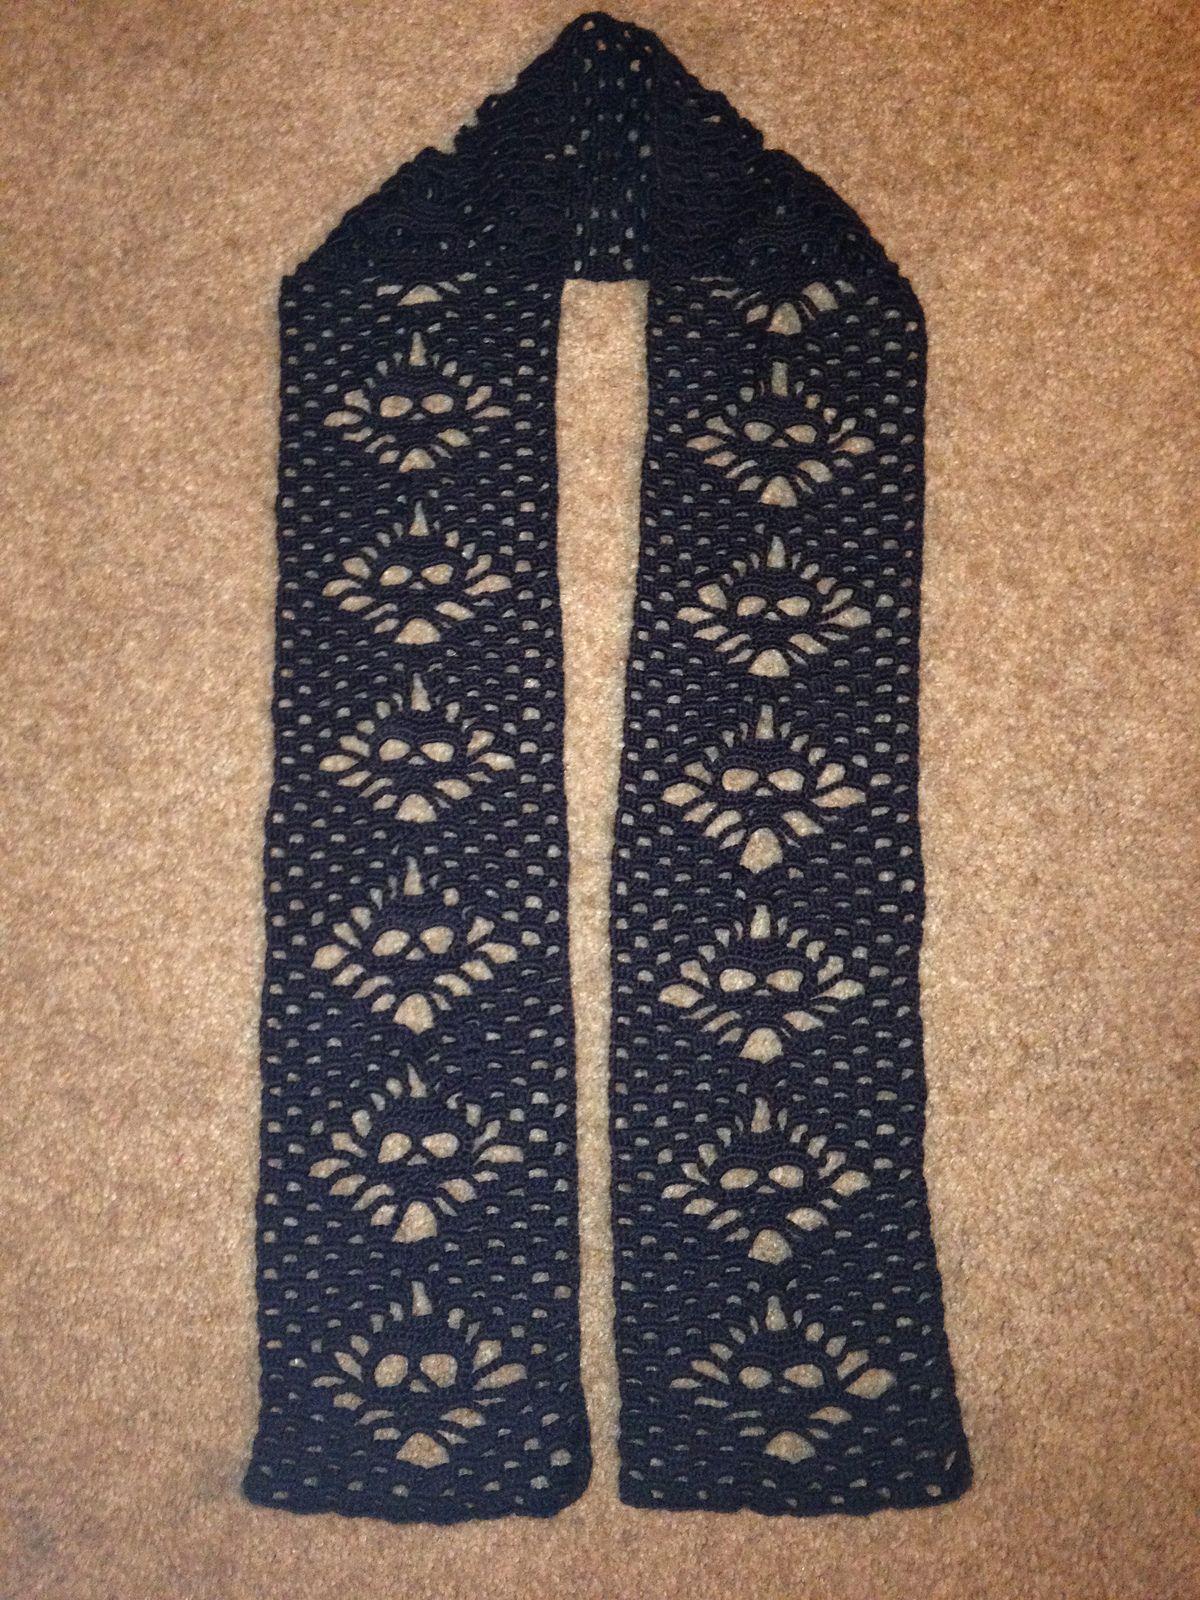 Ravelry: Narrow Crochet Skull Scarf by Karin Kaufmann | Crochet ...